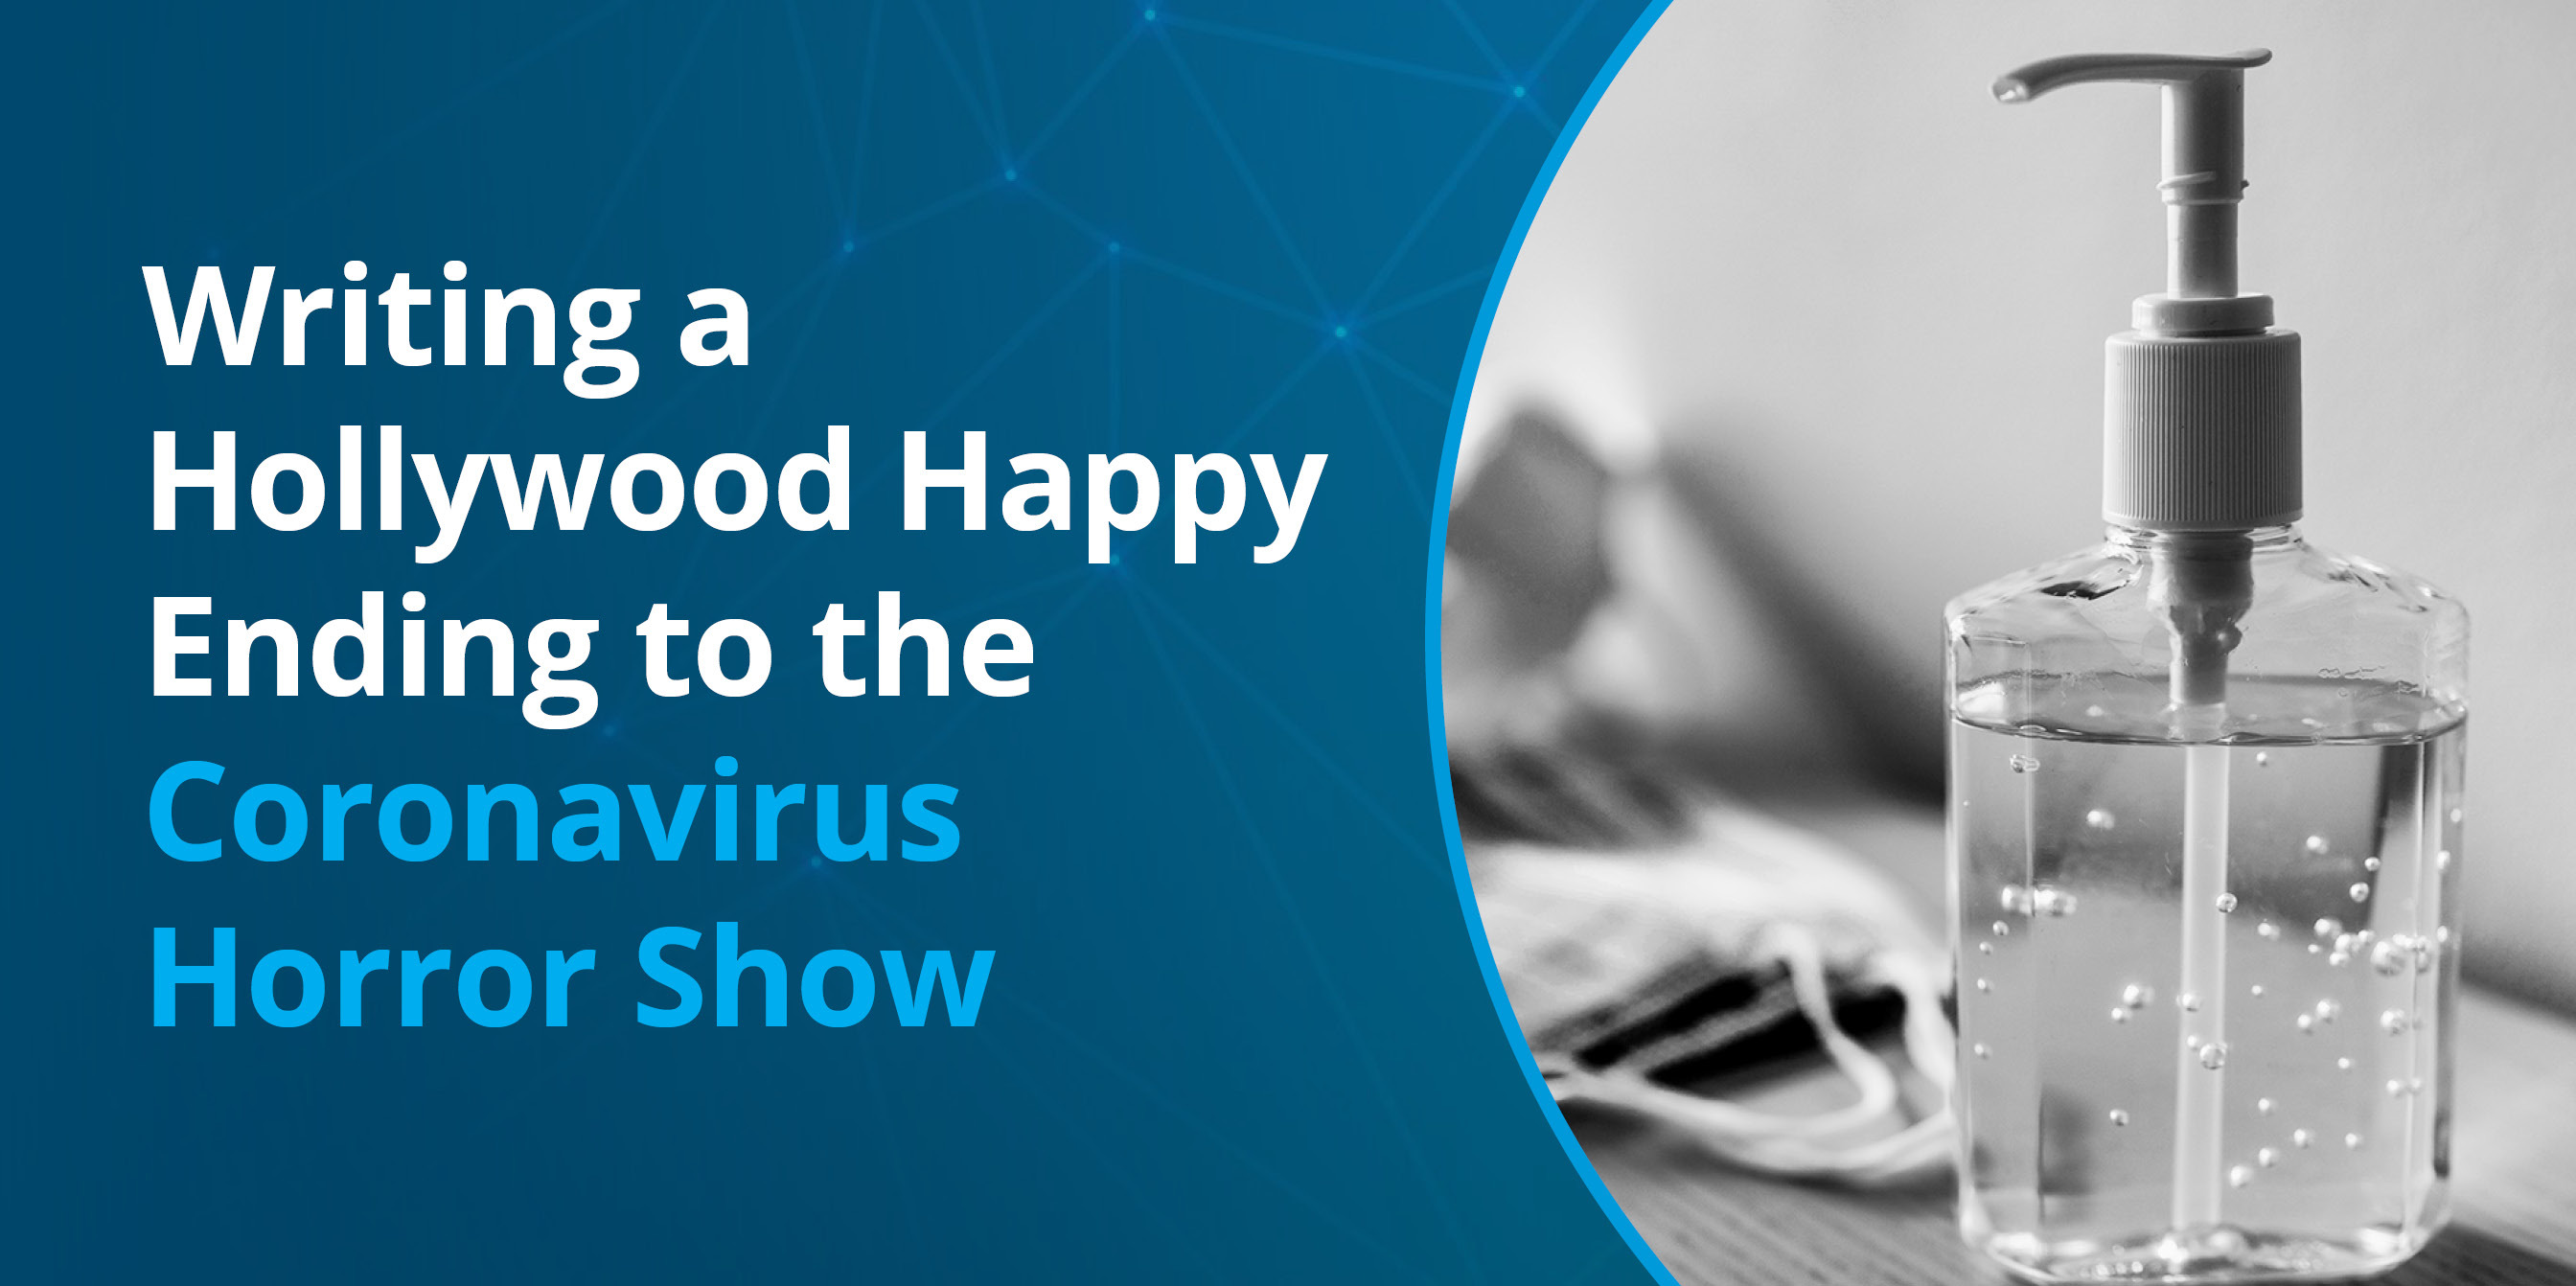 Hollywood Happy Ending to the Coronavirus Horror Show